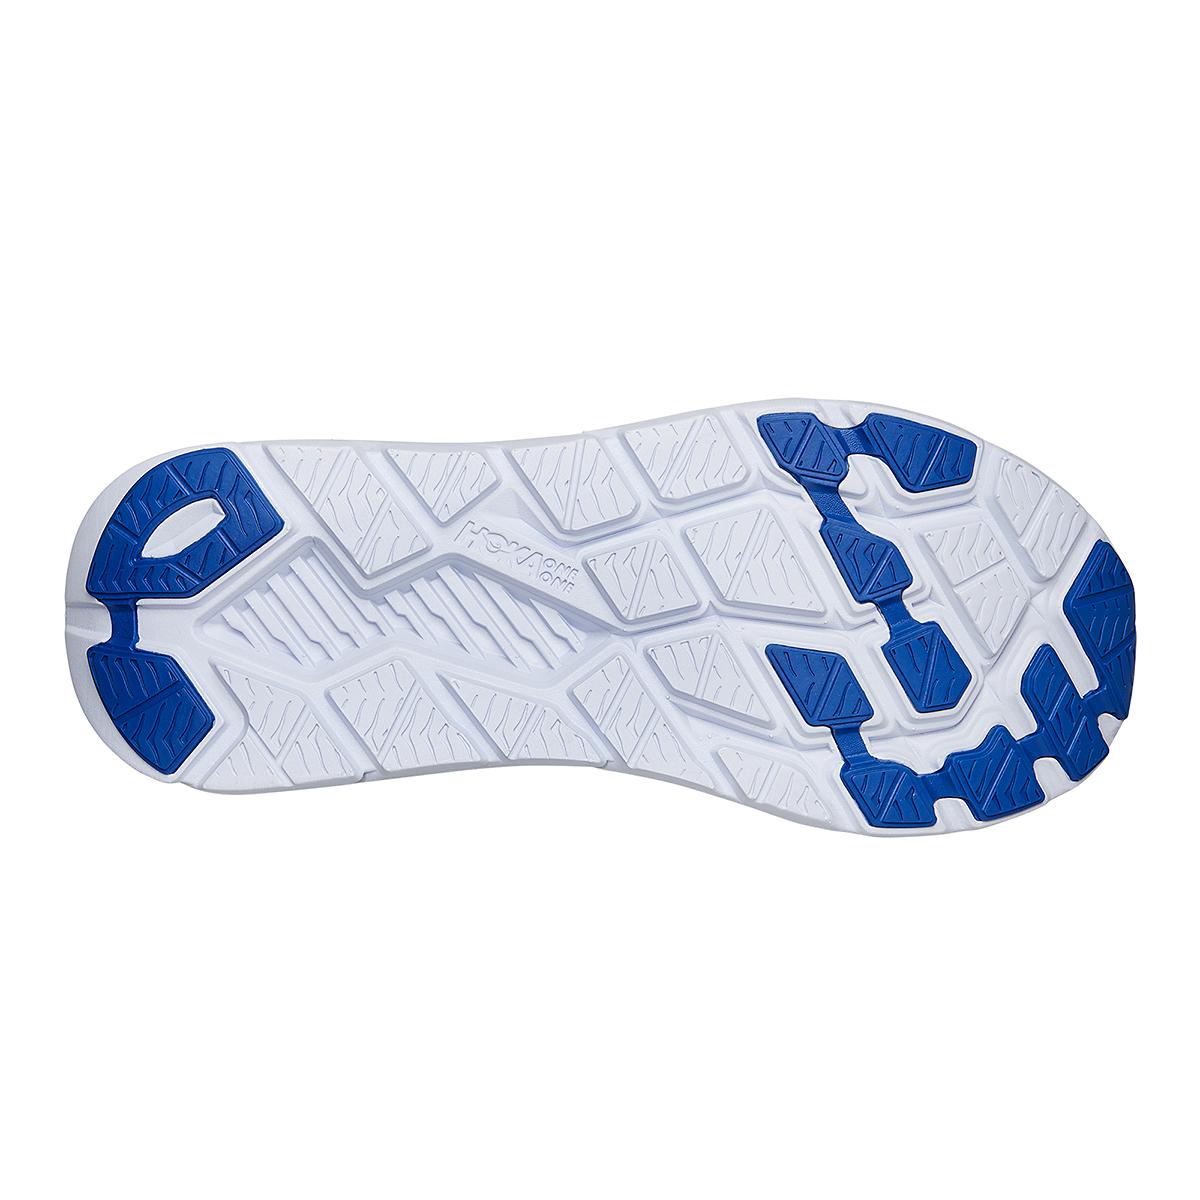 Men's Hoka One One Rincon 2 Running Shoe - Color: Fiesta/Turkish White - Size: 7 - Width: Regular, Fiesta/Turkish White, large, image 6